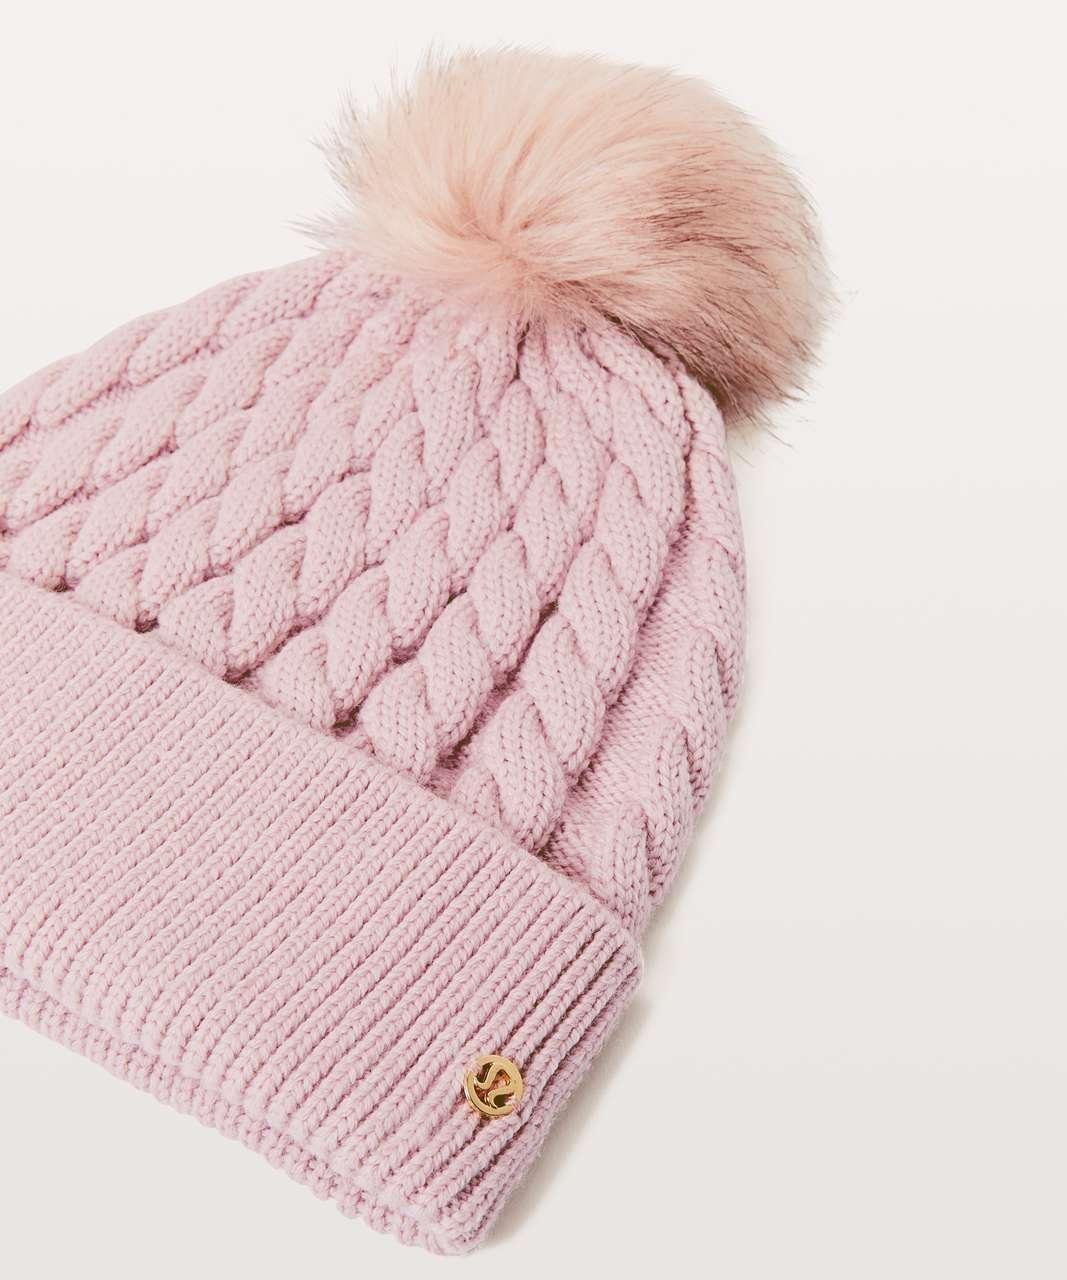 Lululemon Wool Be Toasty Toque - Misty Pink - lulu fanatics b4375d4c1bd